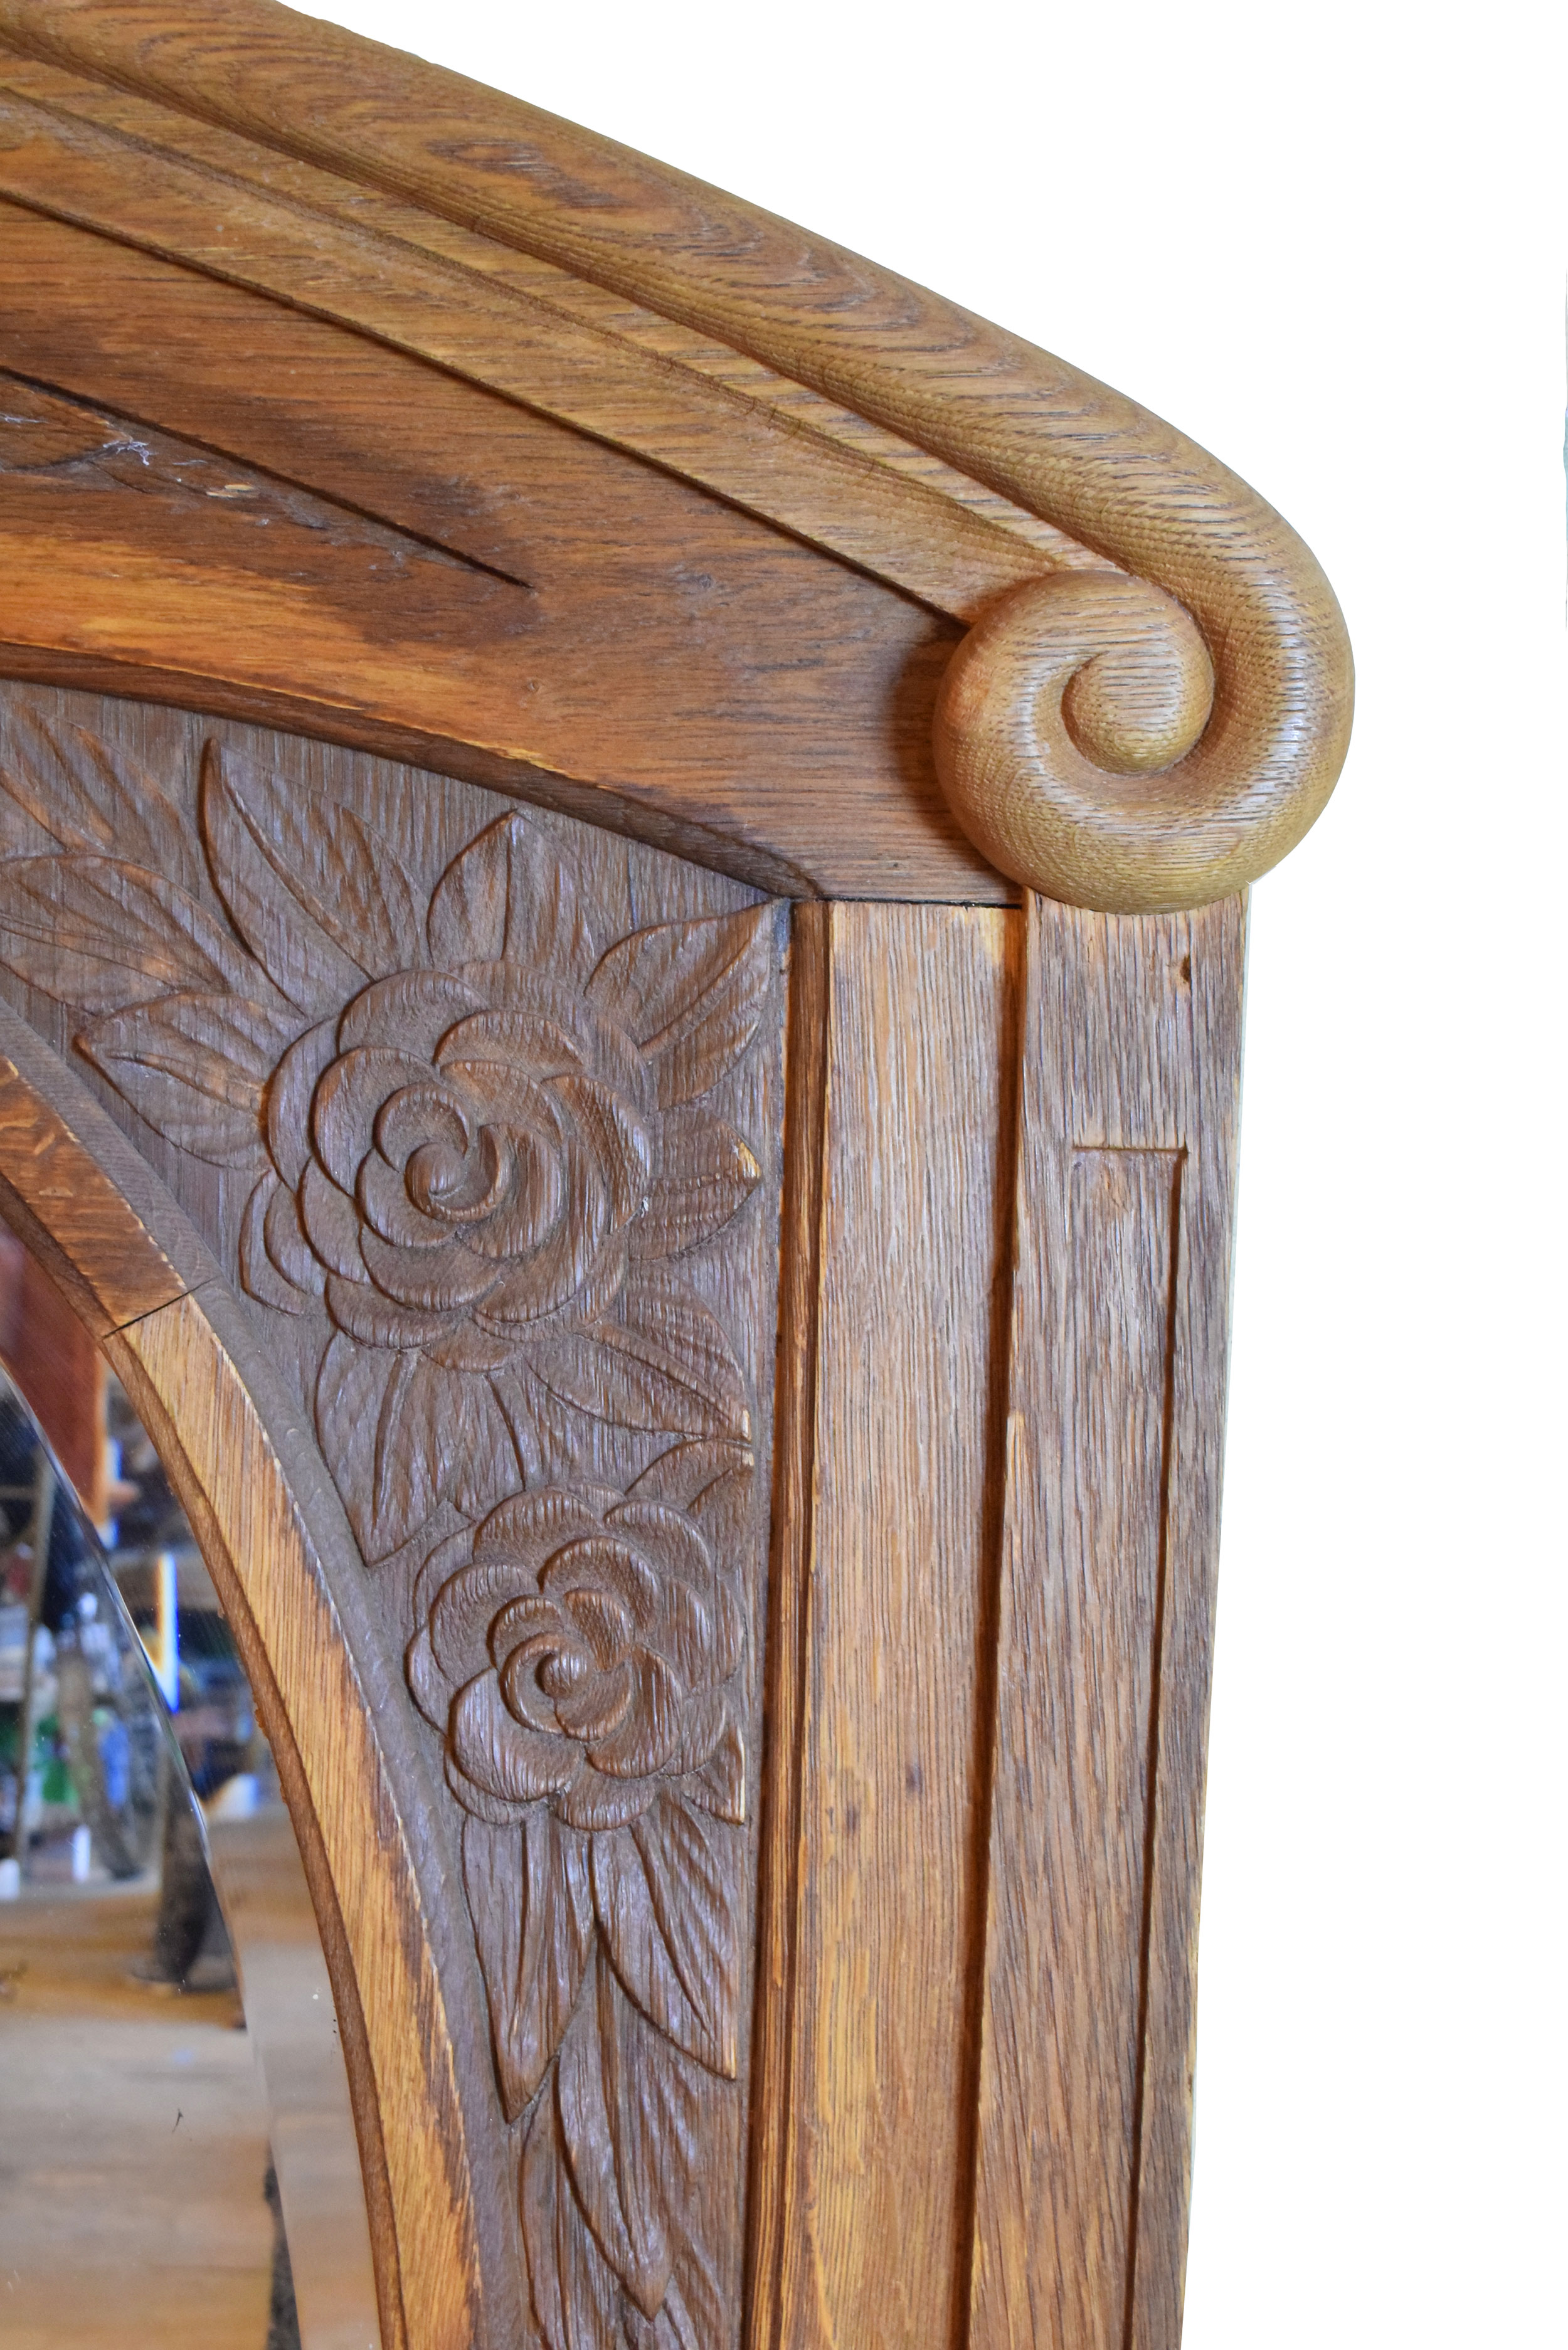 46992-oak-frame-with-ocal-mirrors-detail.jpg